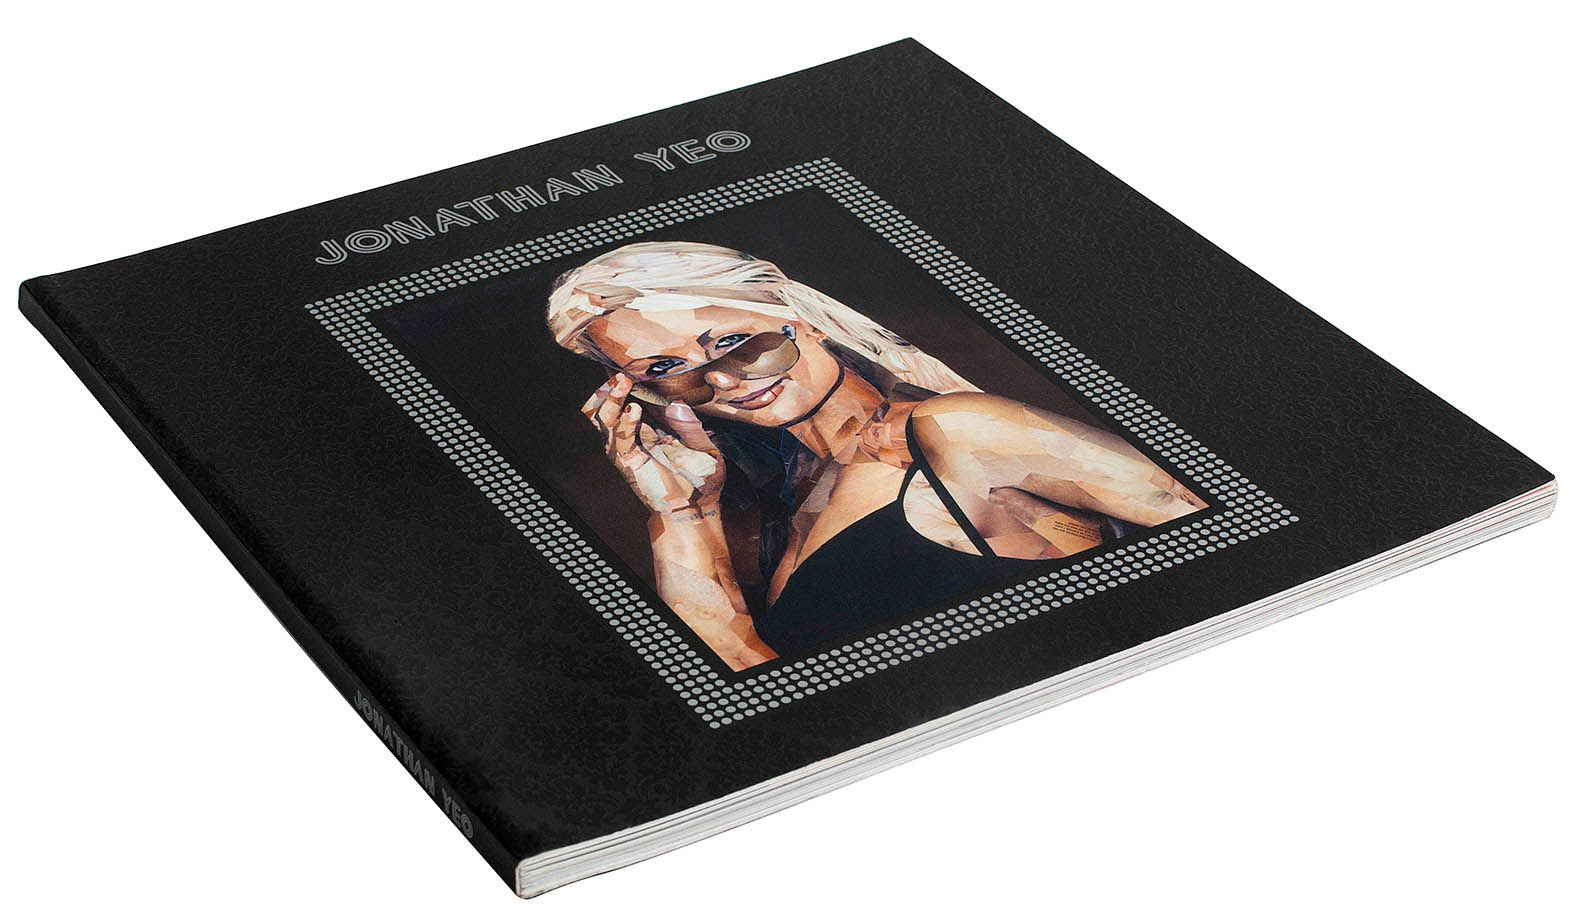 Jonathan Yeo - Lazarides show book